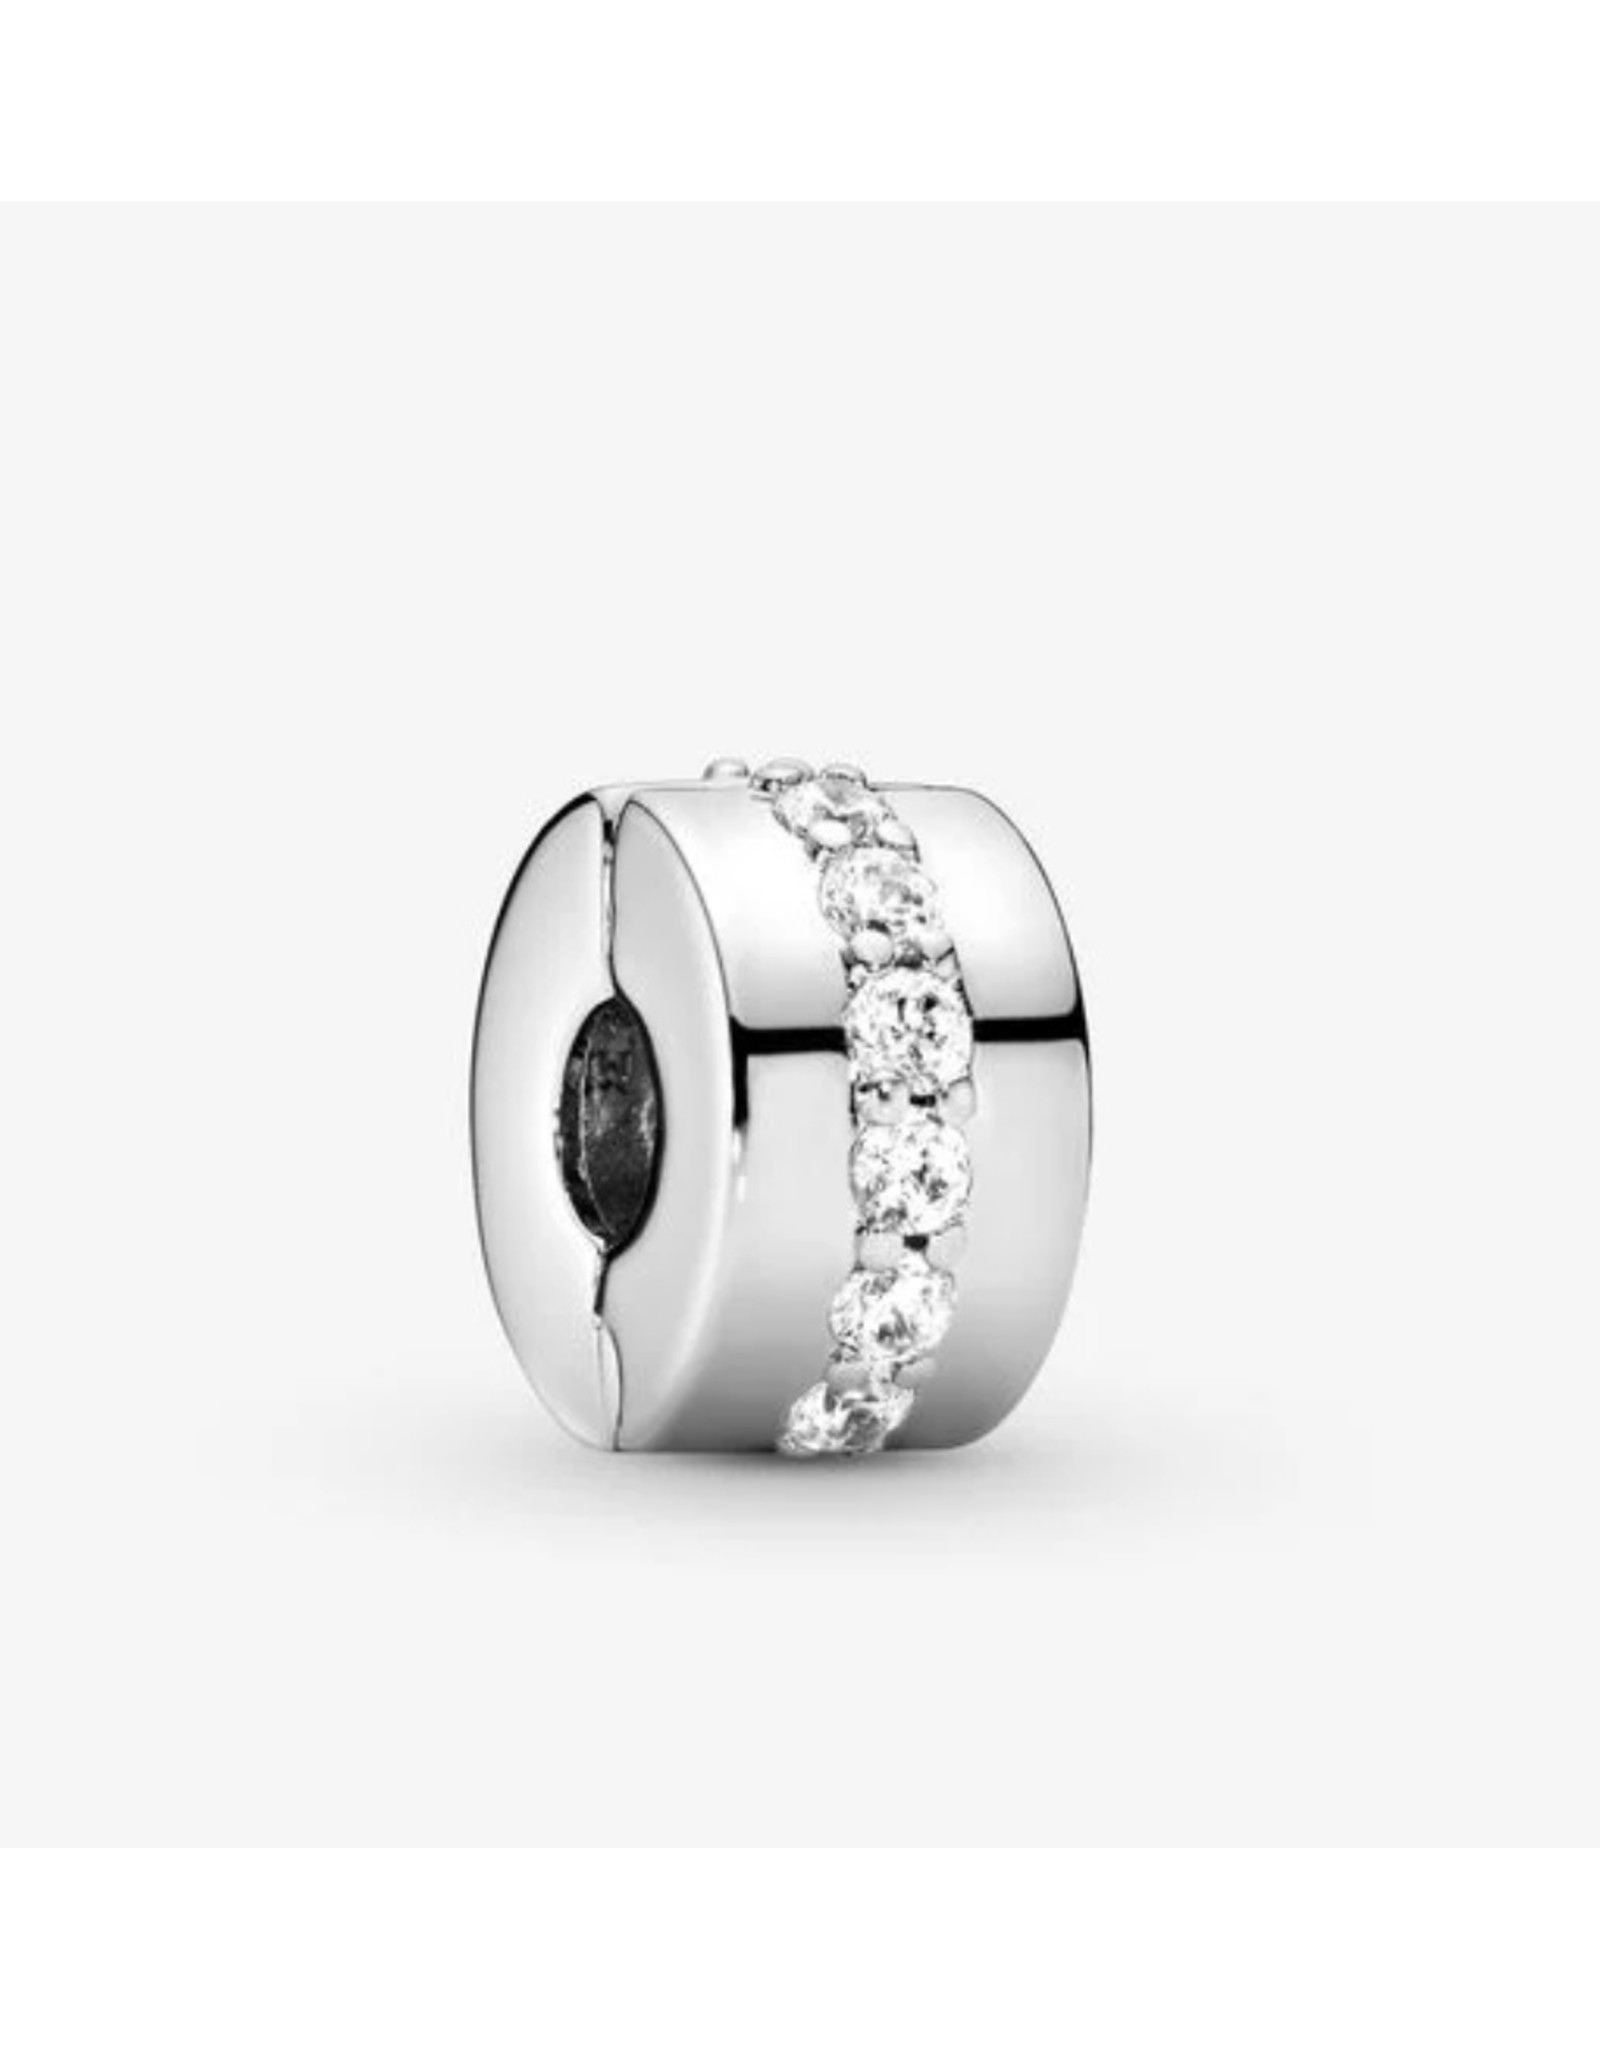 Pandora Pandora Clip,791972CZ, Shining Path, Clear CZ